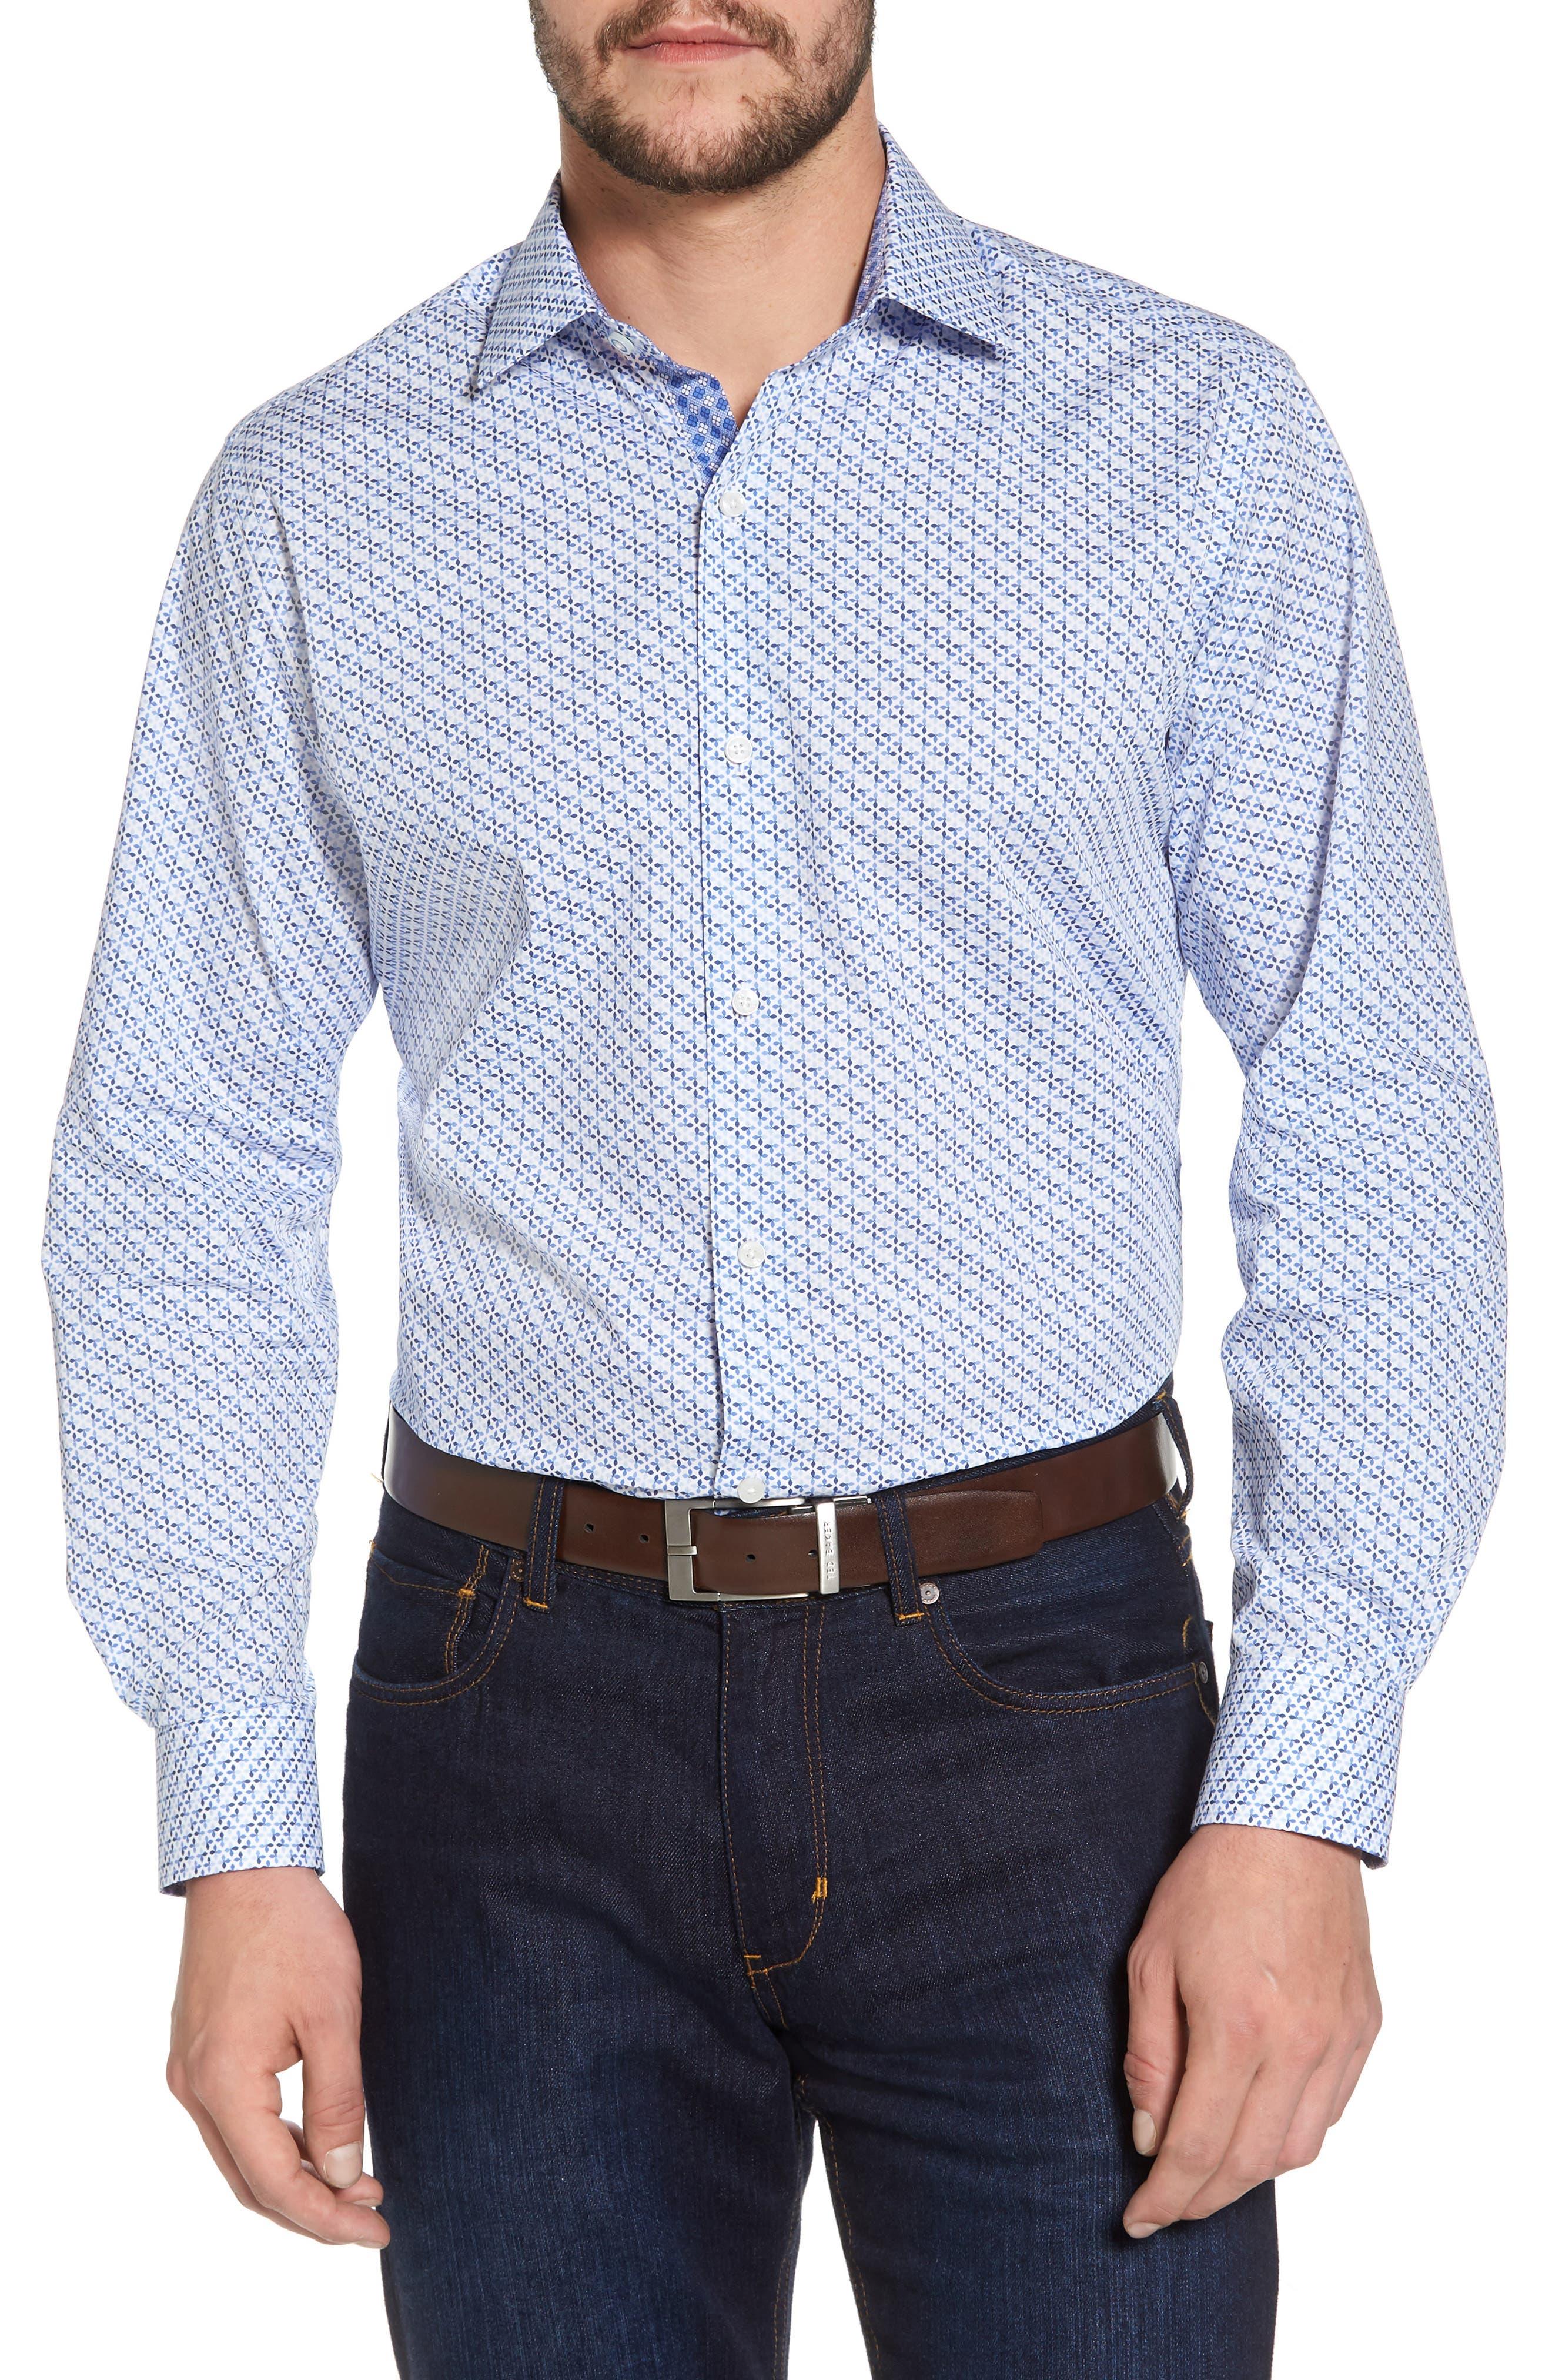 Alternate Image 1 Selected - TailorByrd Simon Regular Fit Geo Print Sport Shirt